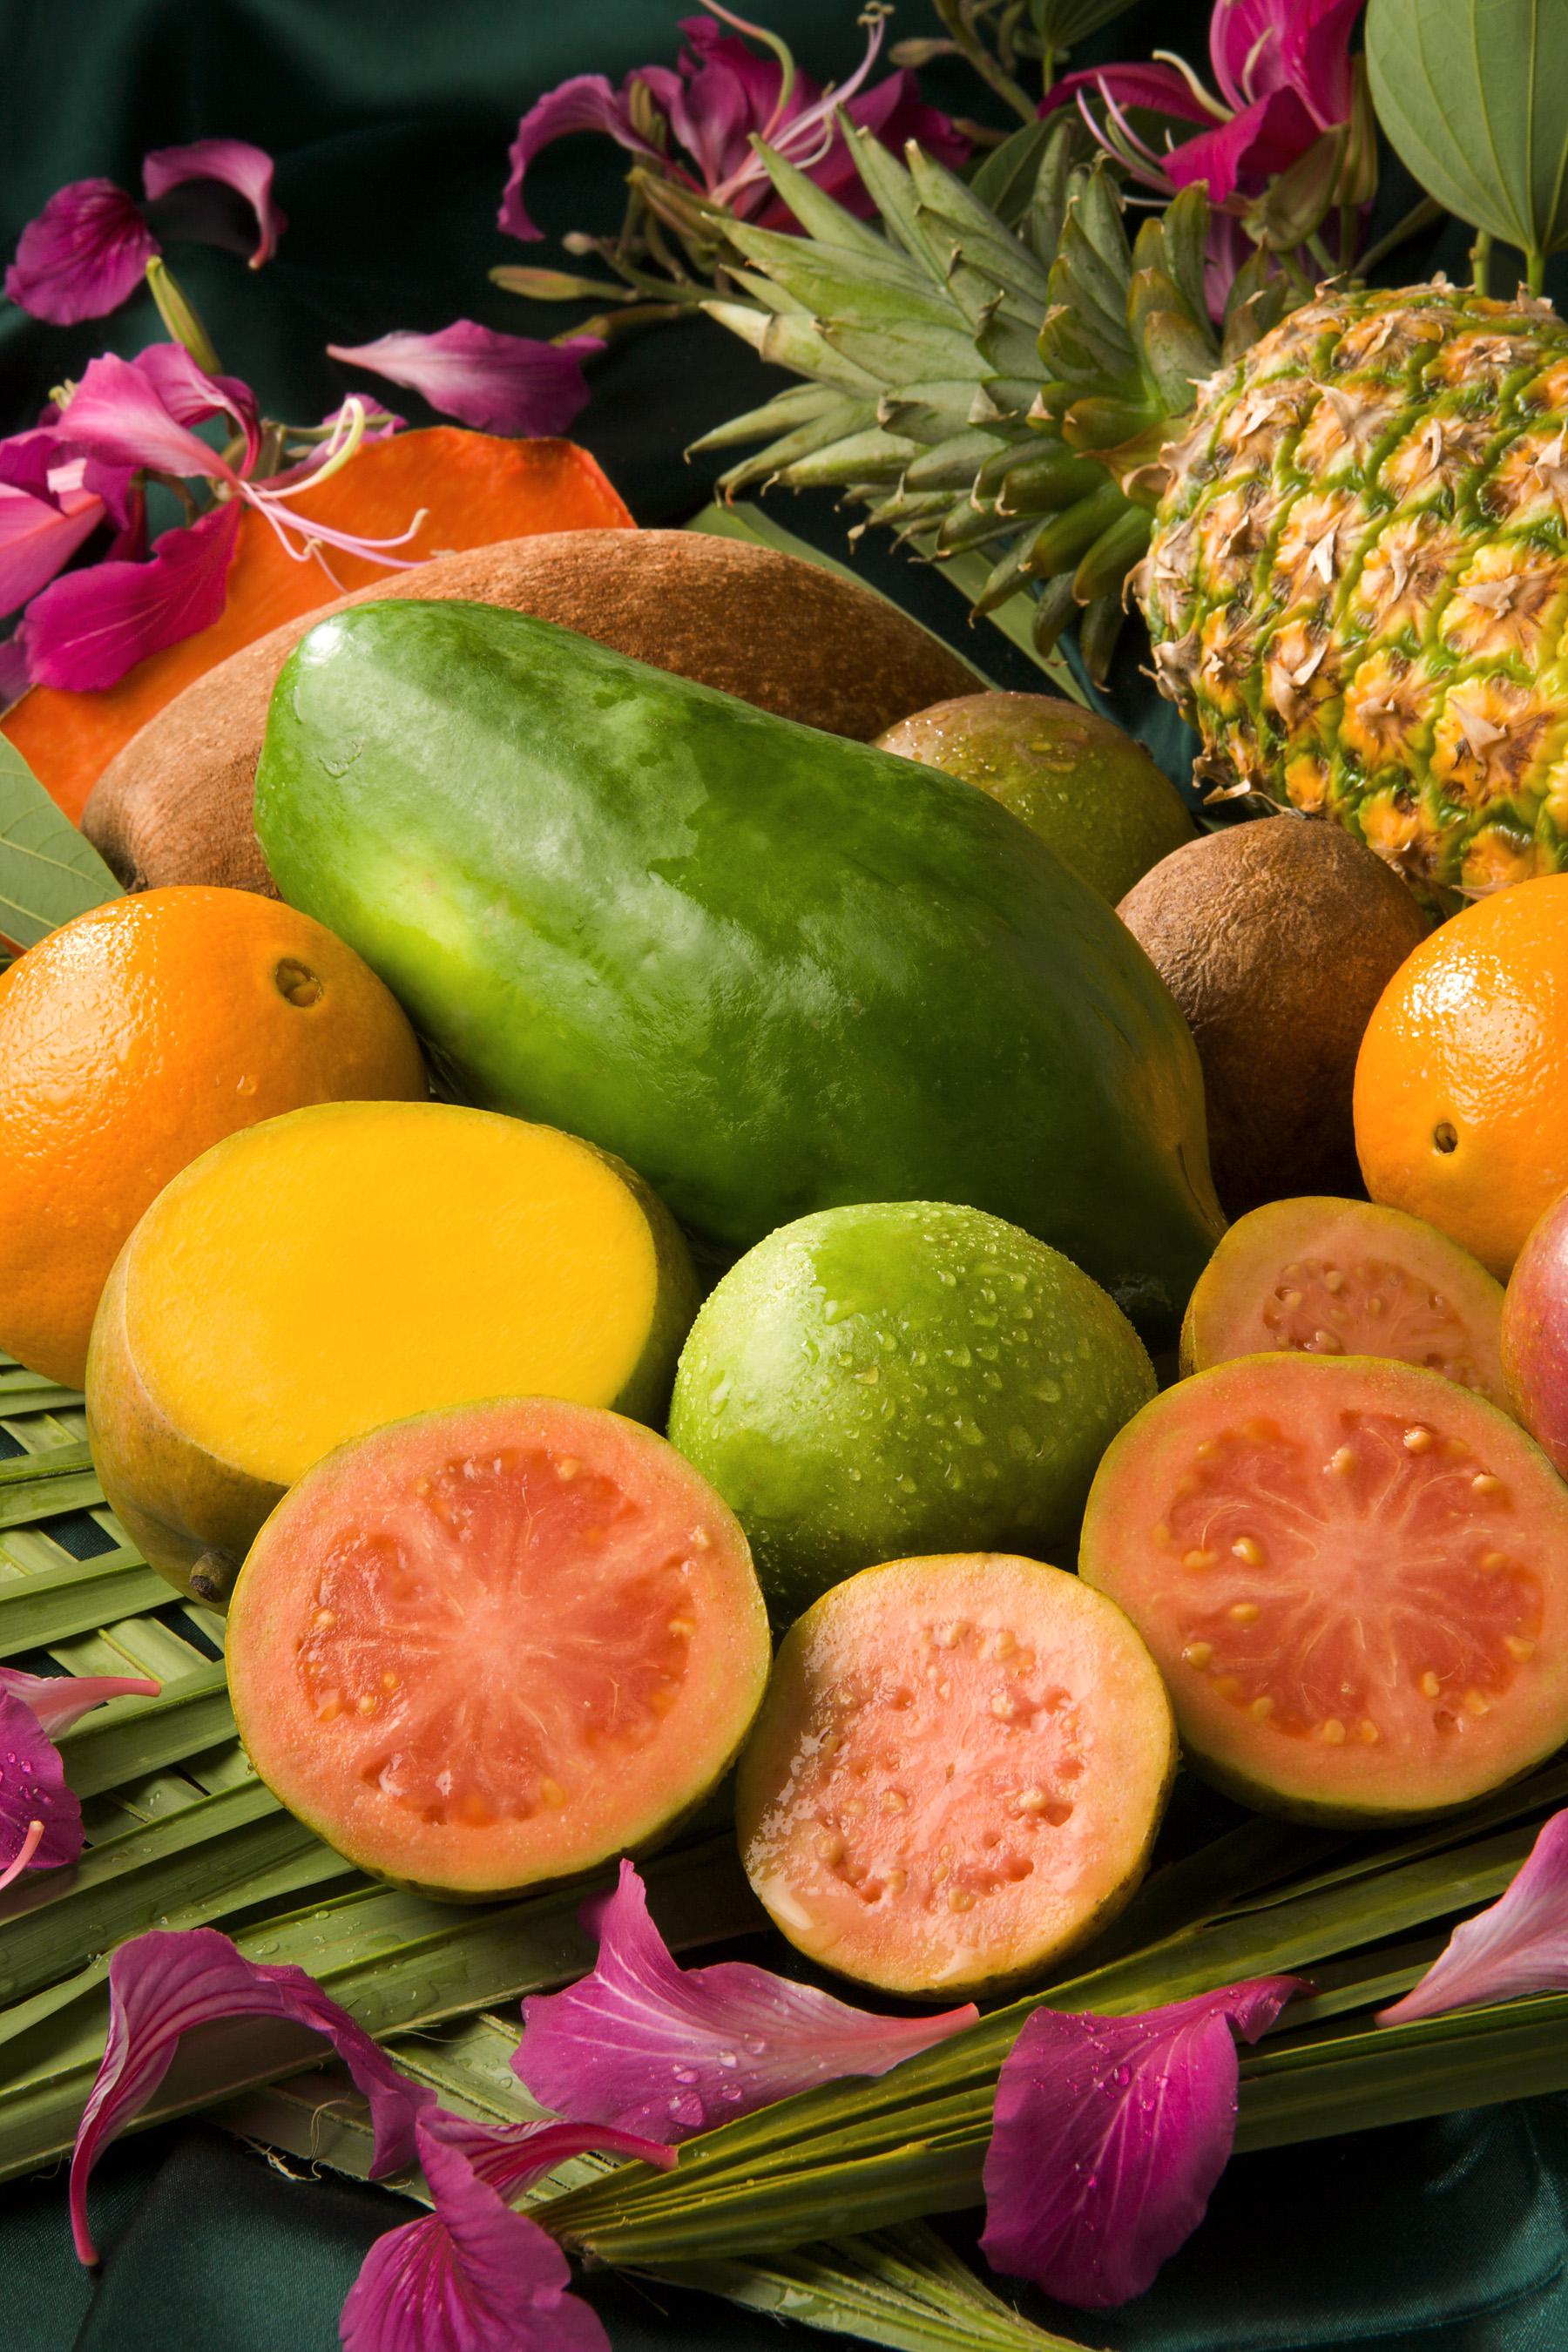 ars_tropical_fruit_no_labels